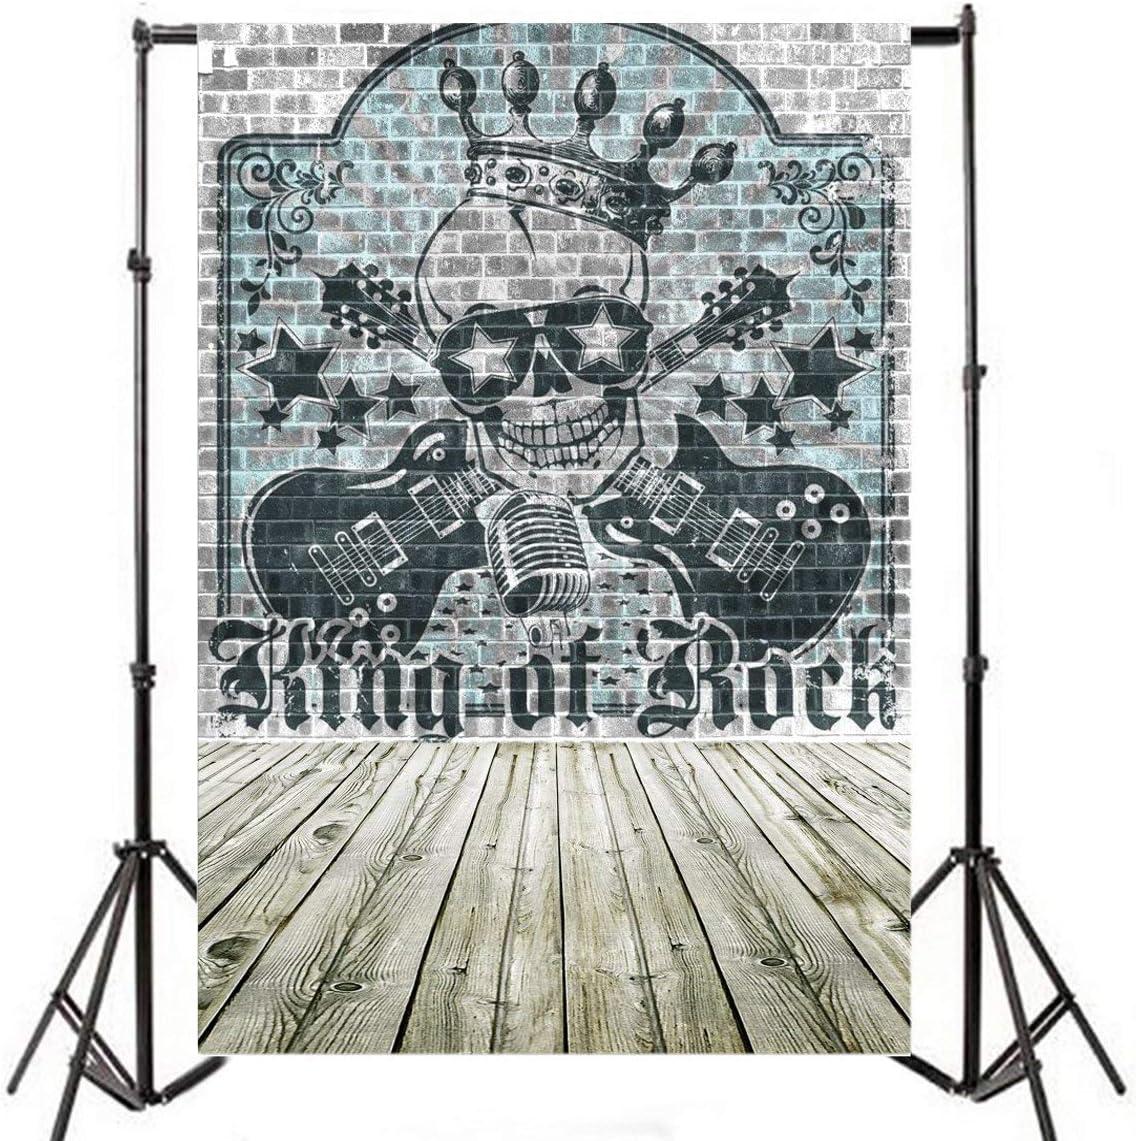 5x7ft Rock Music Photography Background Skull King Guitar Vintage Graffiti Brick Wall Backdrop Punk Vocal Concert Tour Retro Stylish Trendy Man Boy Girl Portrait Photo Studio Props Wallpaper